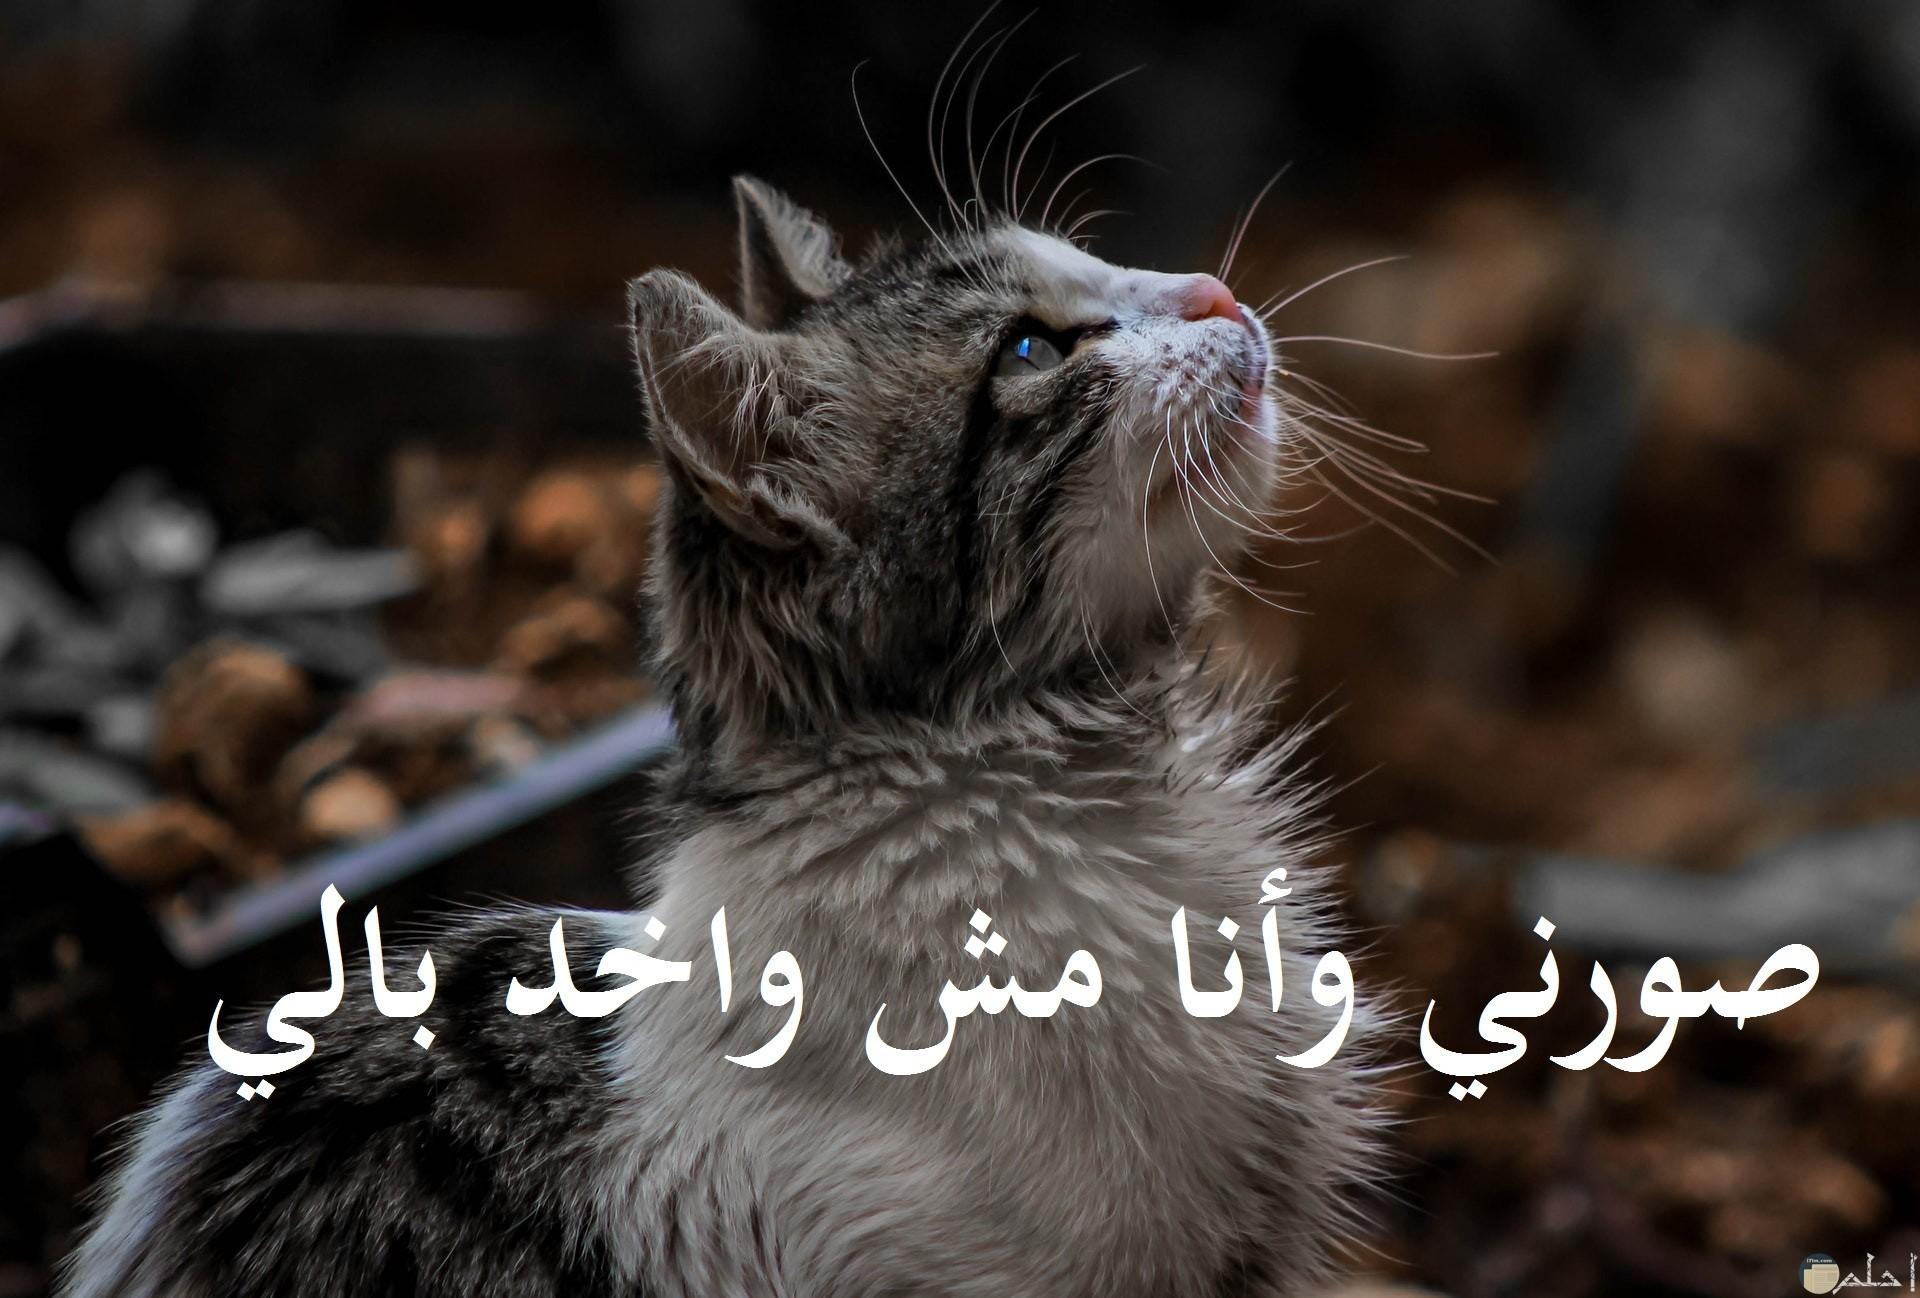 لما تطلب تتصور و أنت مش واخد بالك...